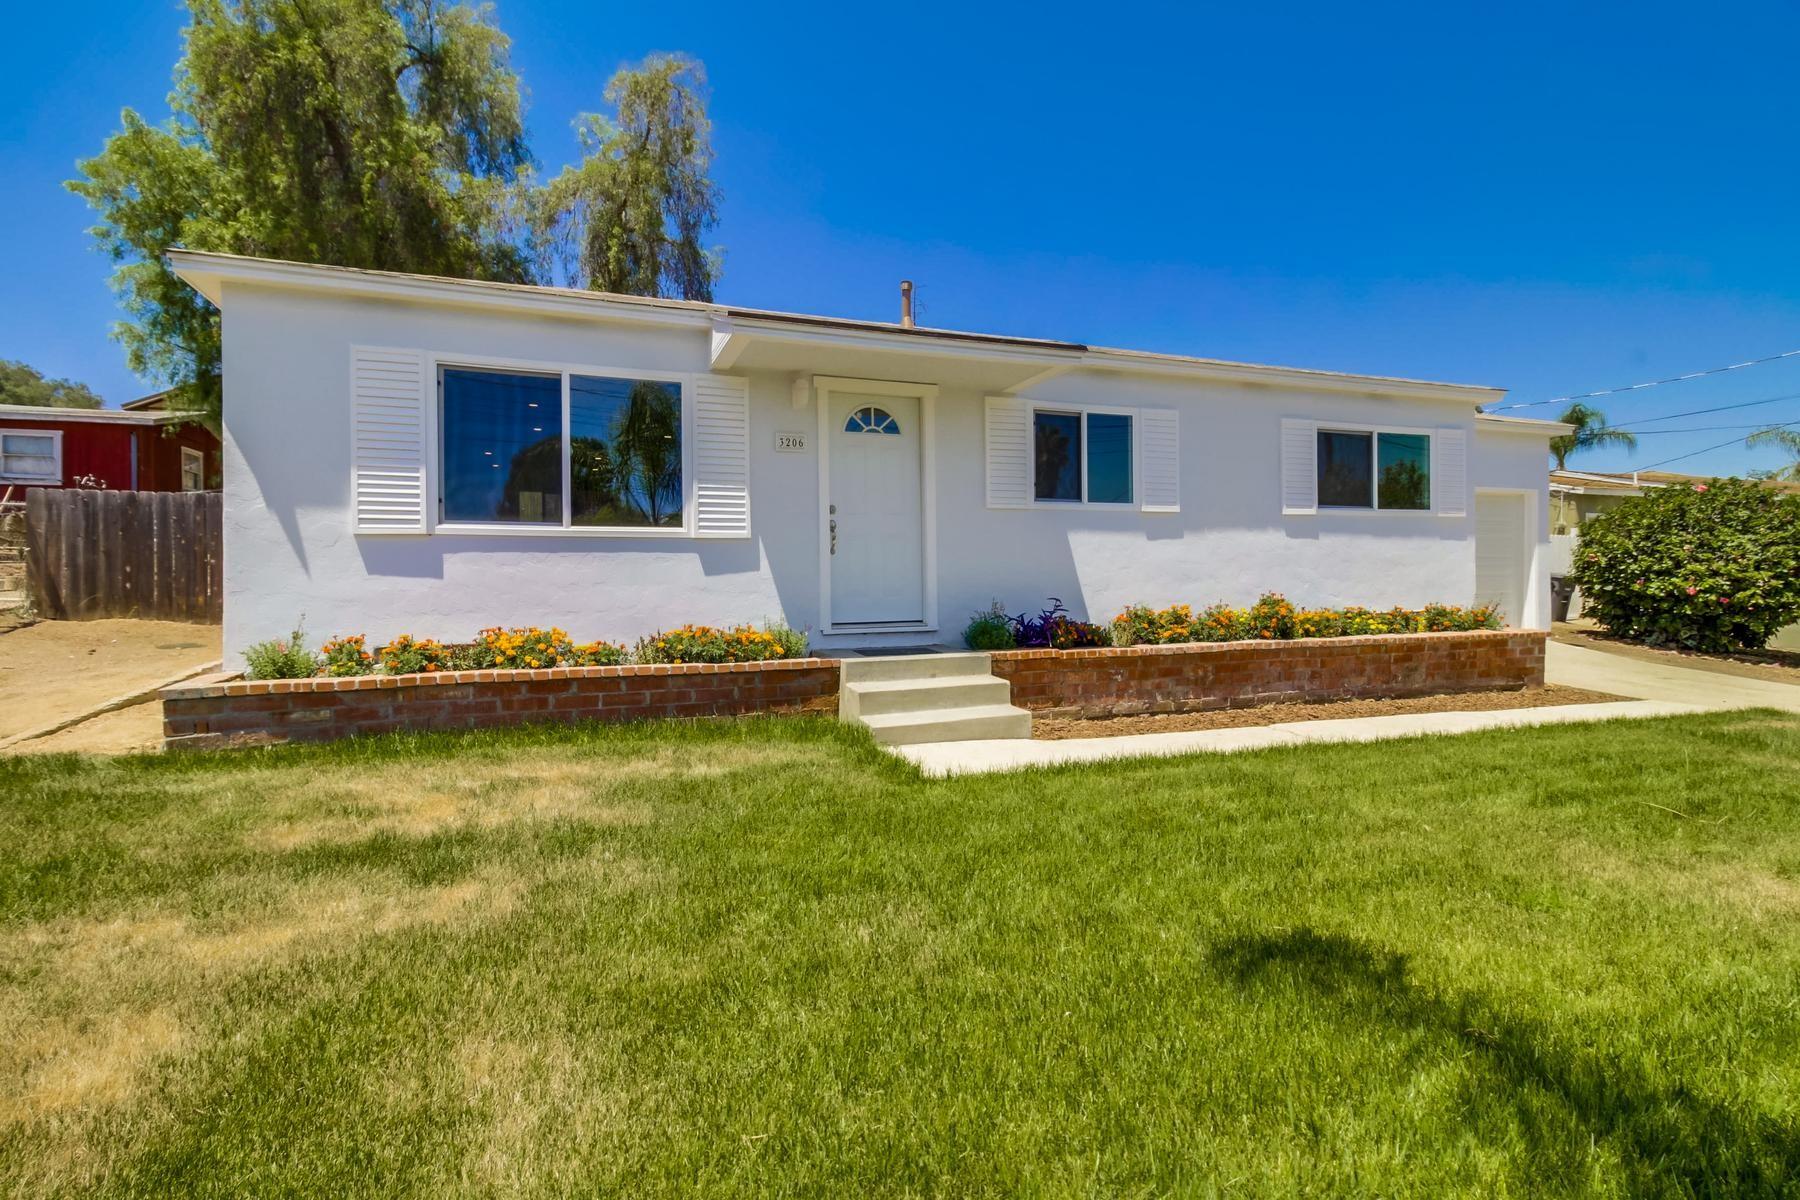 Single Family Home for Sale at 3206 Citrus Street Lemon Grove, California, 91945 United States